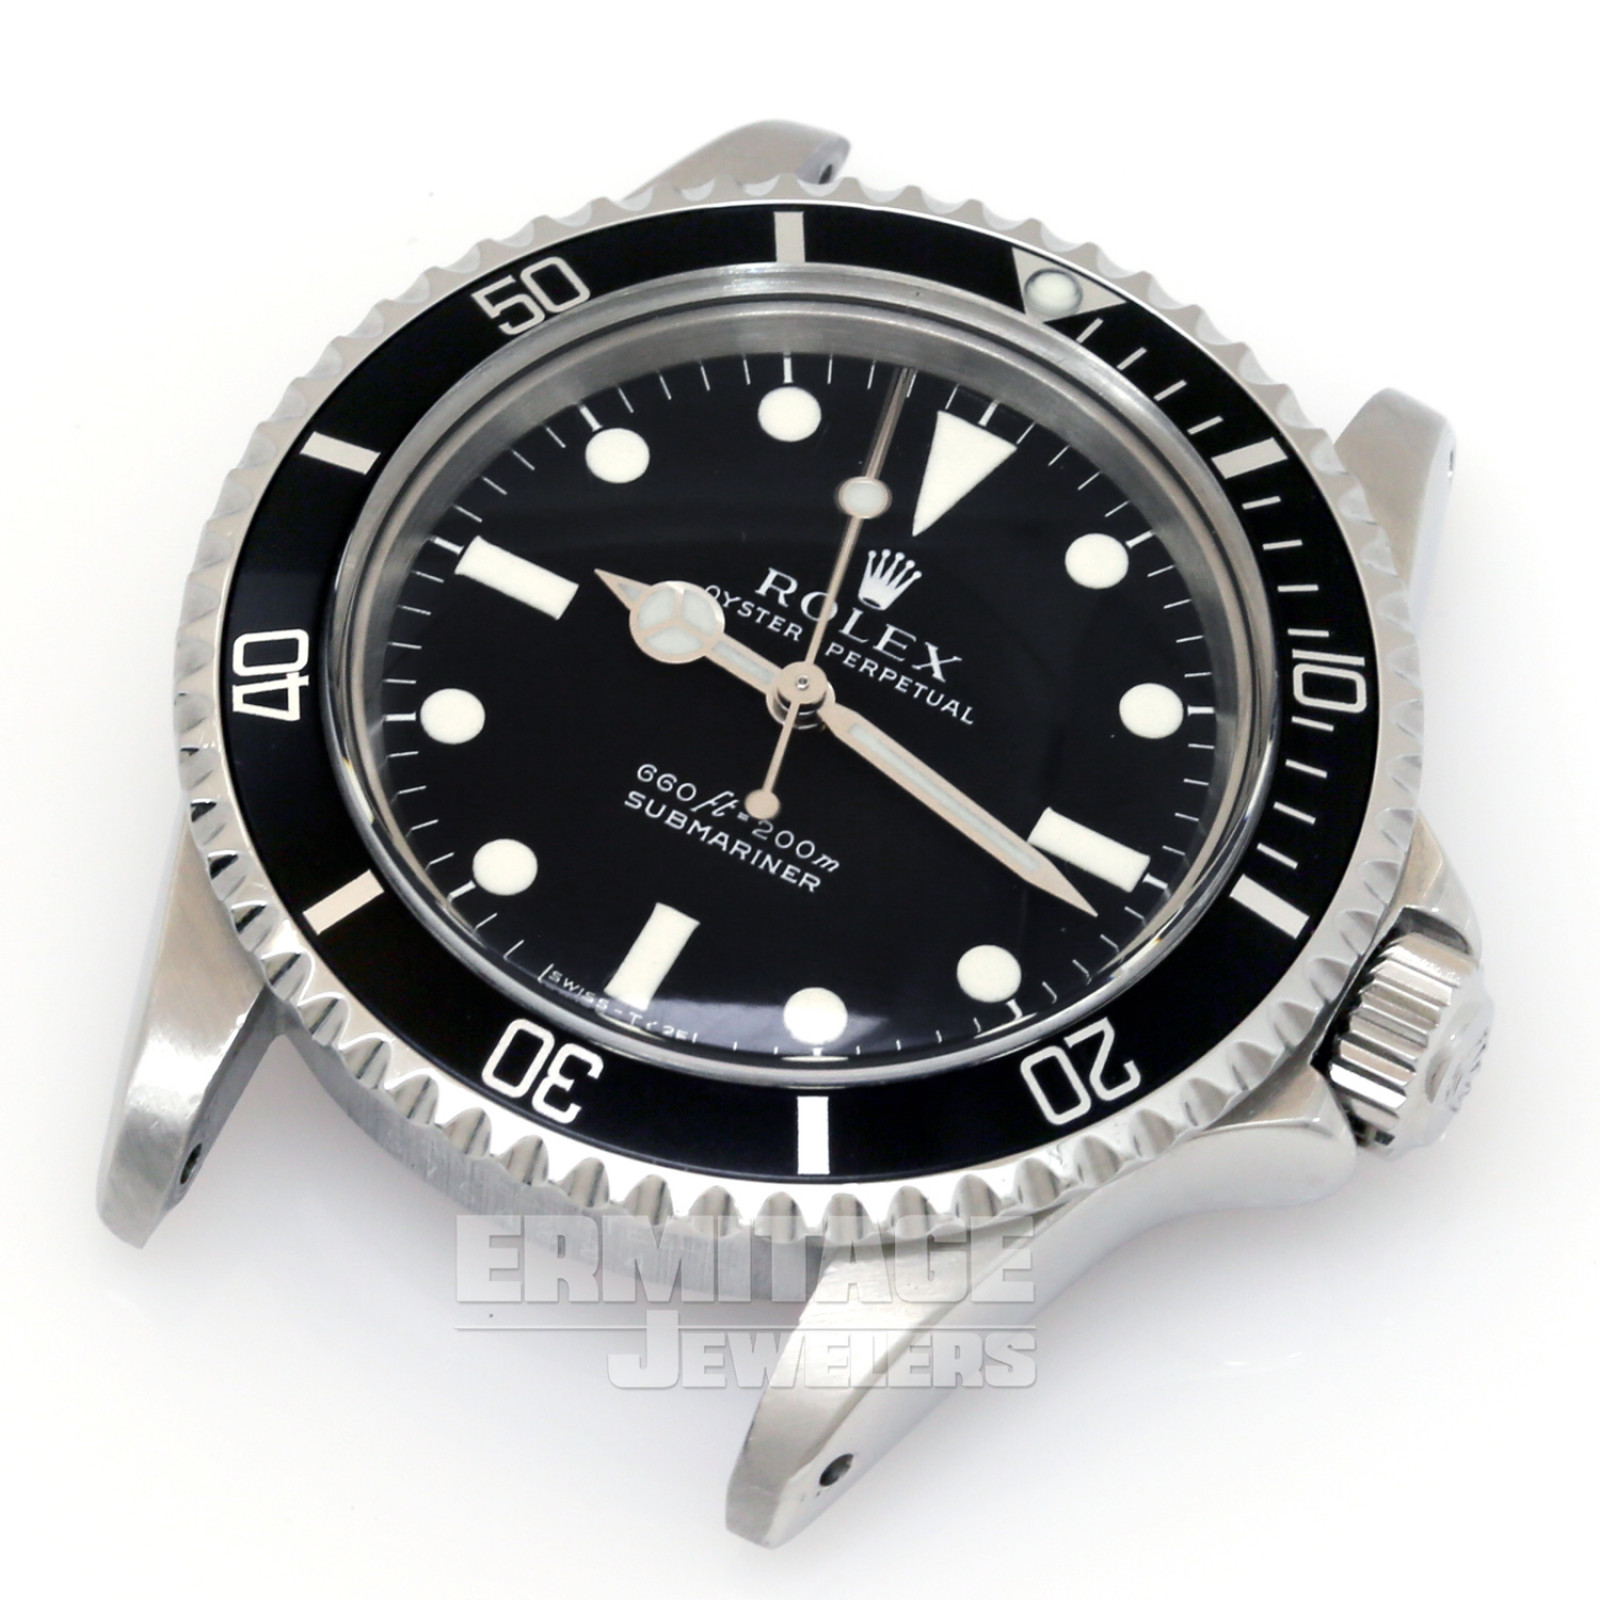 Vintage Rare Rolex Submariner 5513